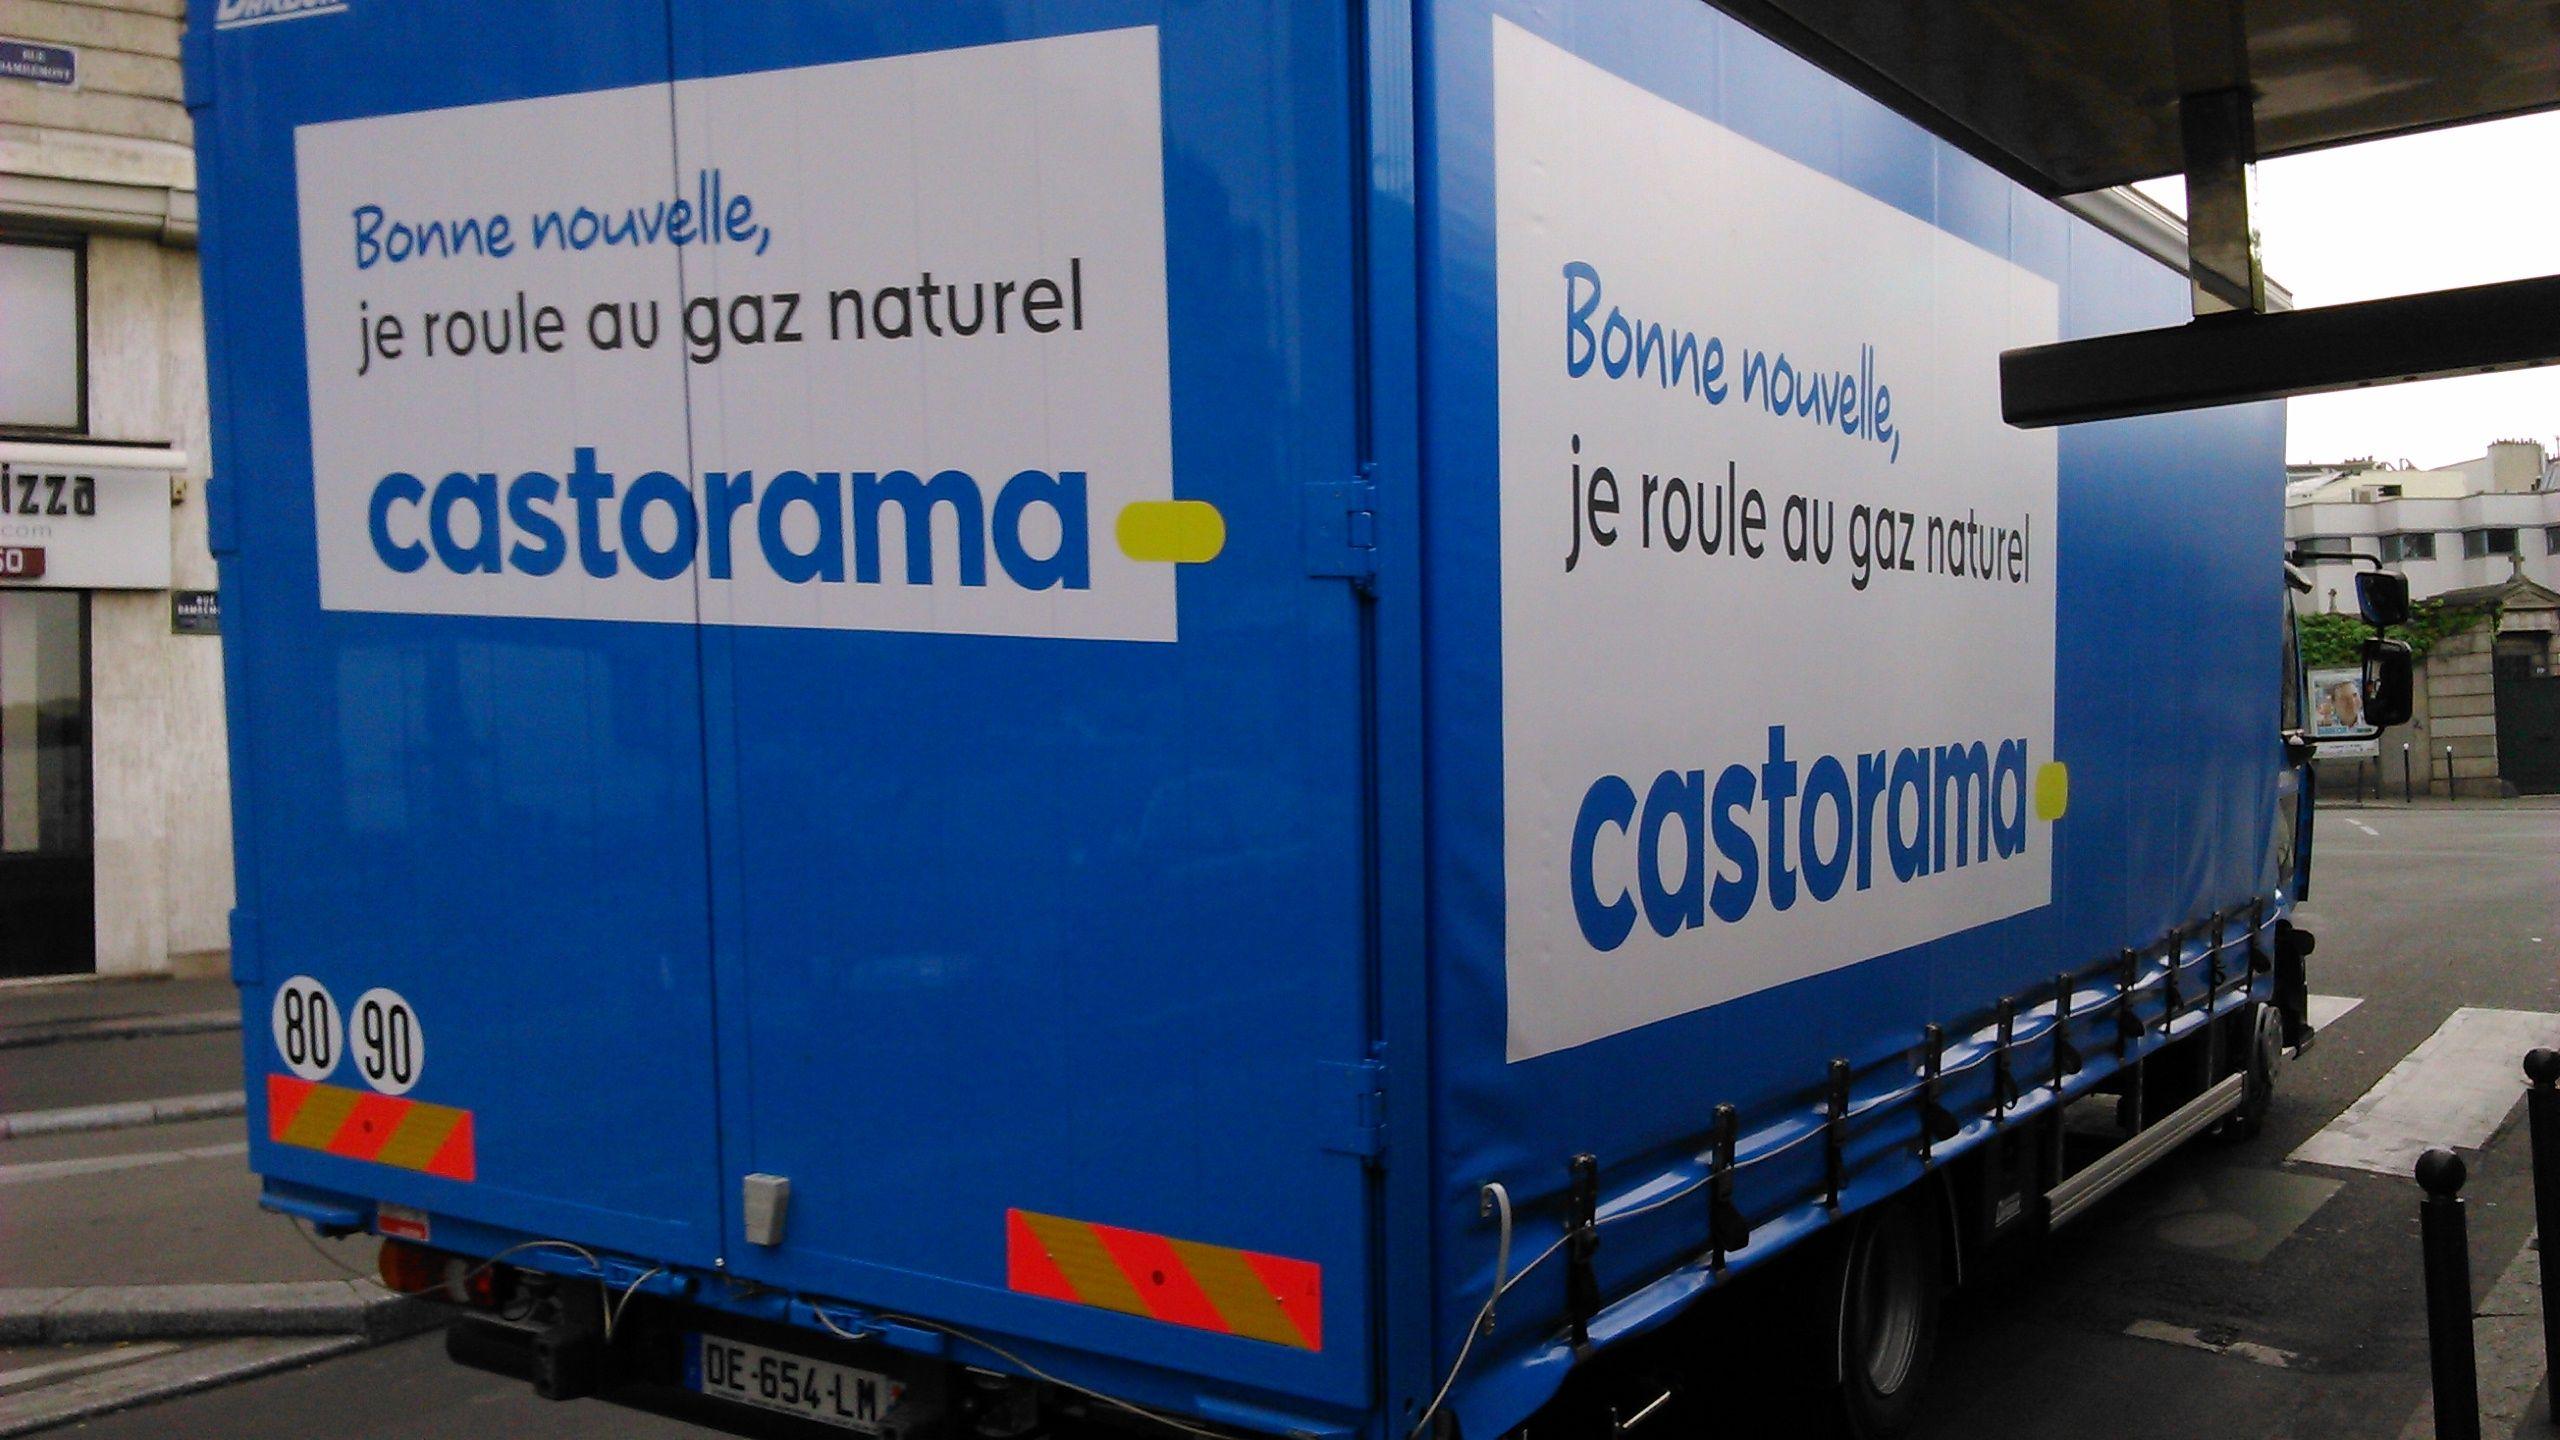 Camion Renault Trucks Pvi Au Gnv Location Camion Castorama Camion Renault